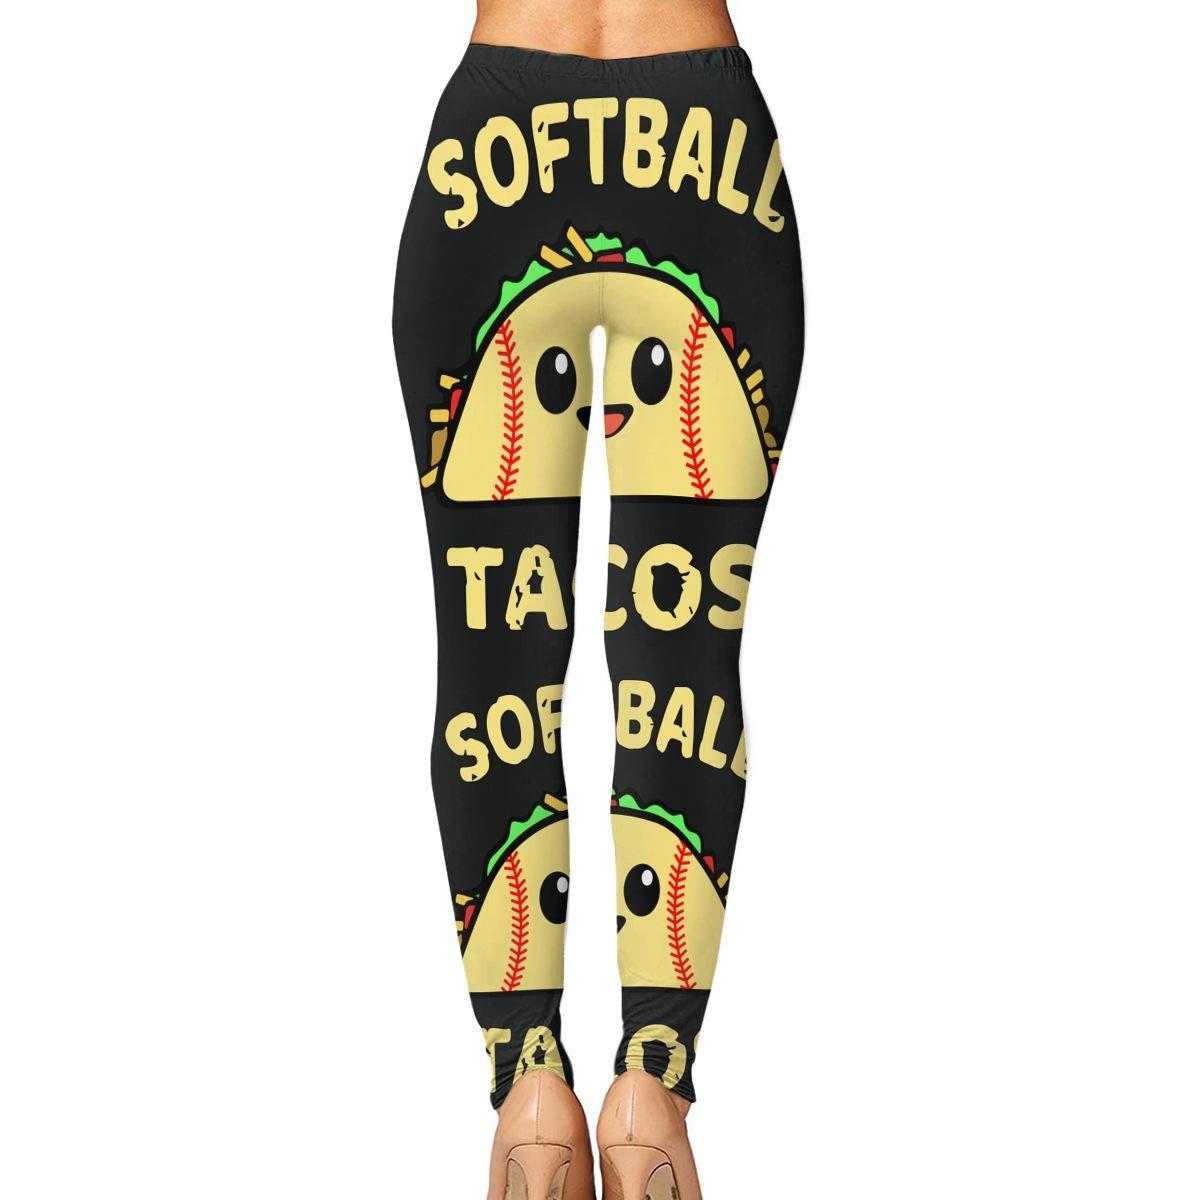 Liu Chao Softball and Tacos Funny Womens Yoga Pants Running ...